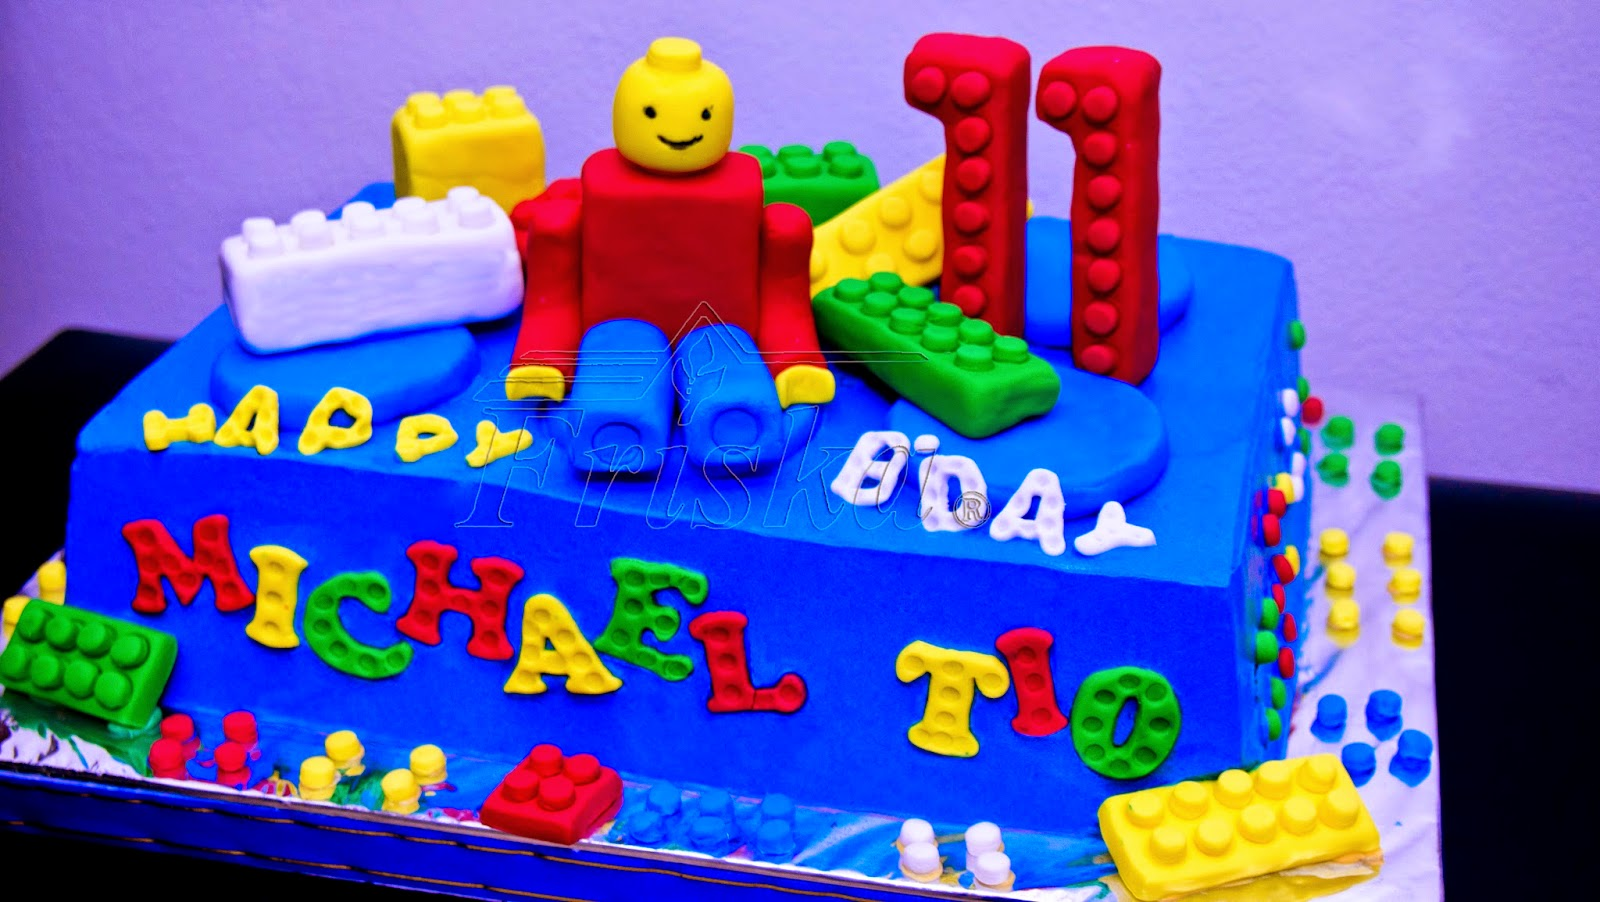 Friska Bakery Cake SPECIAL ORDER CAKES